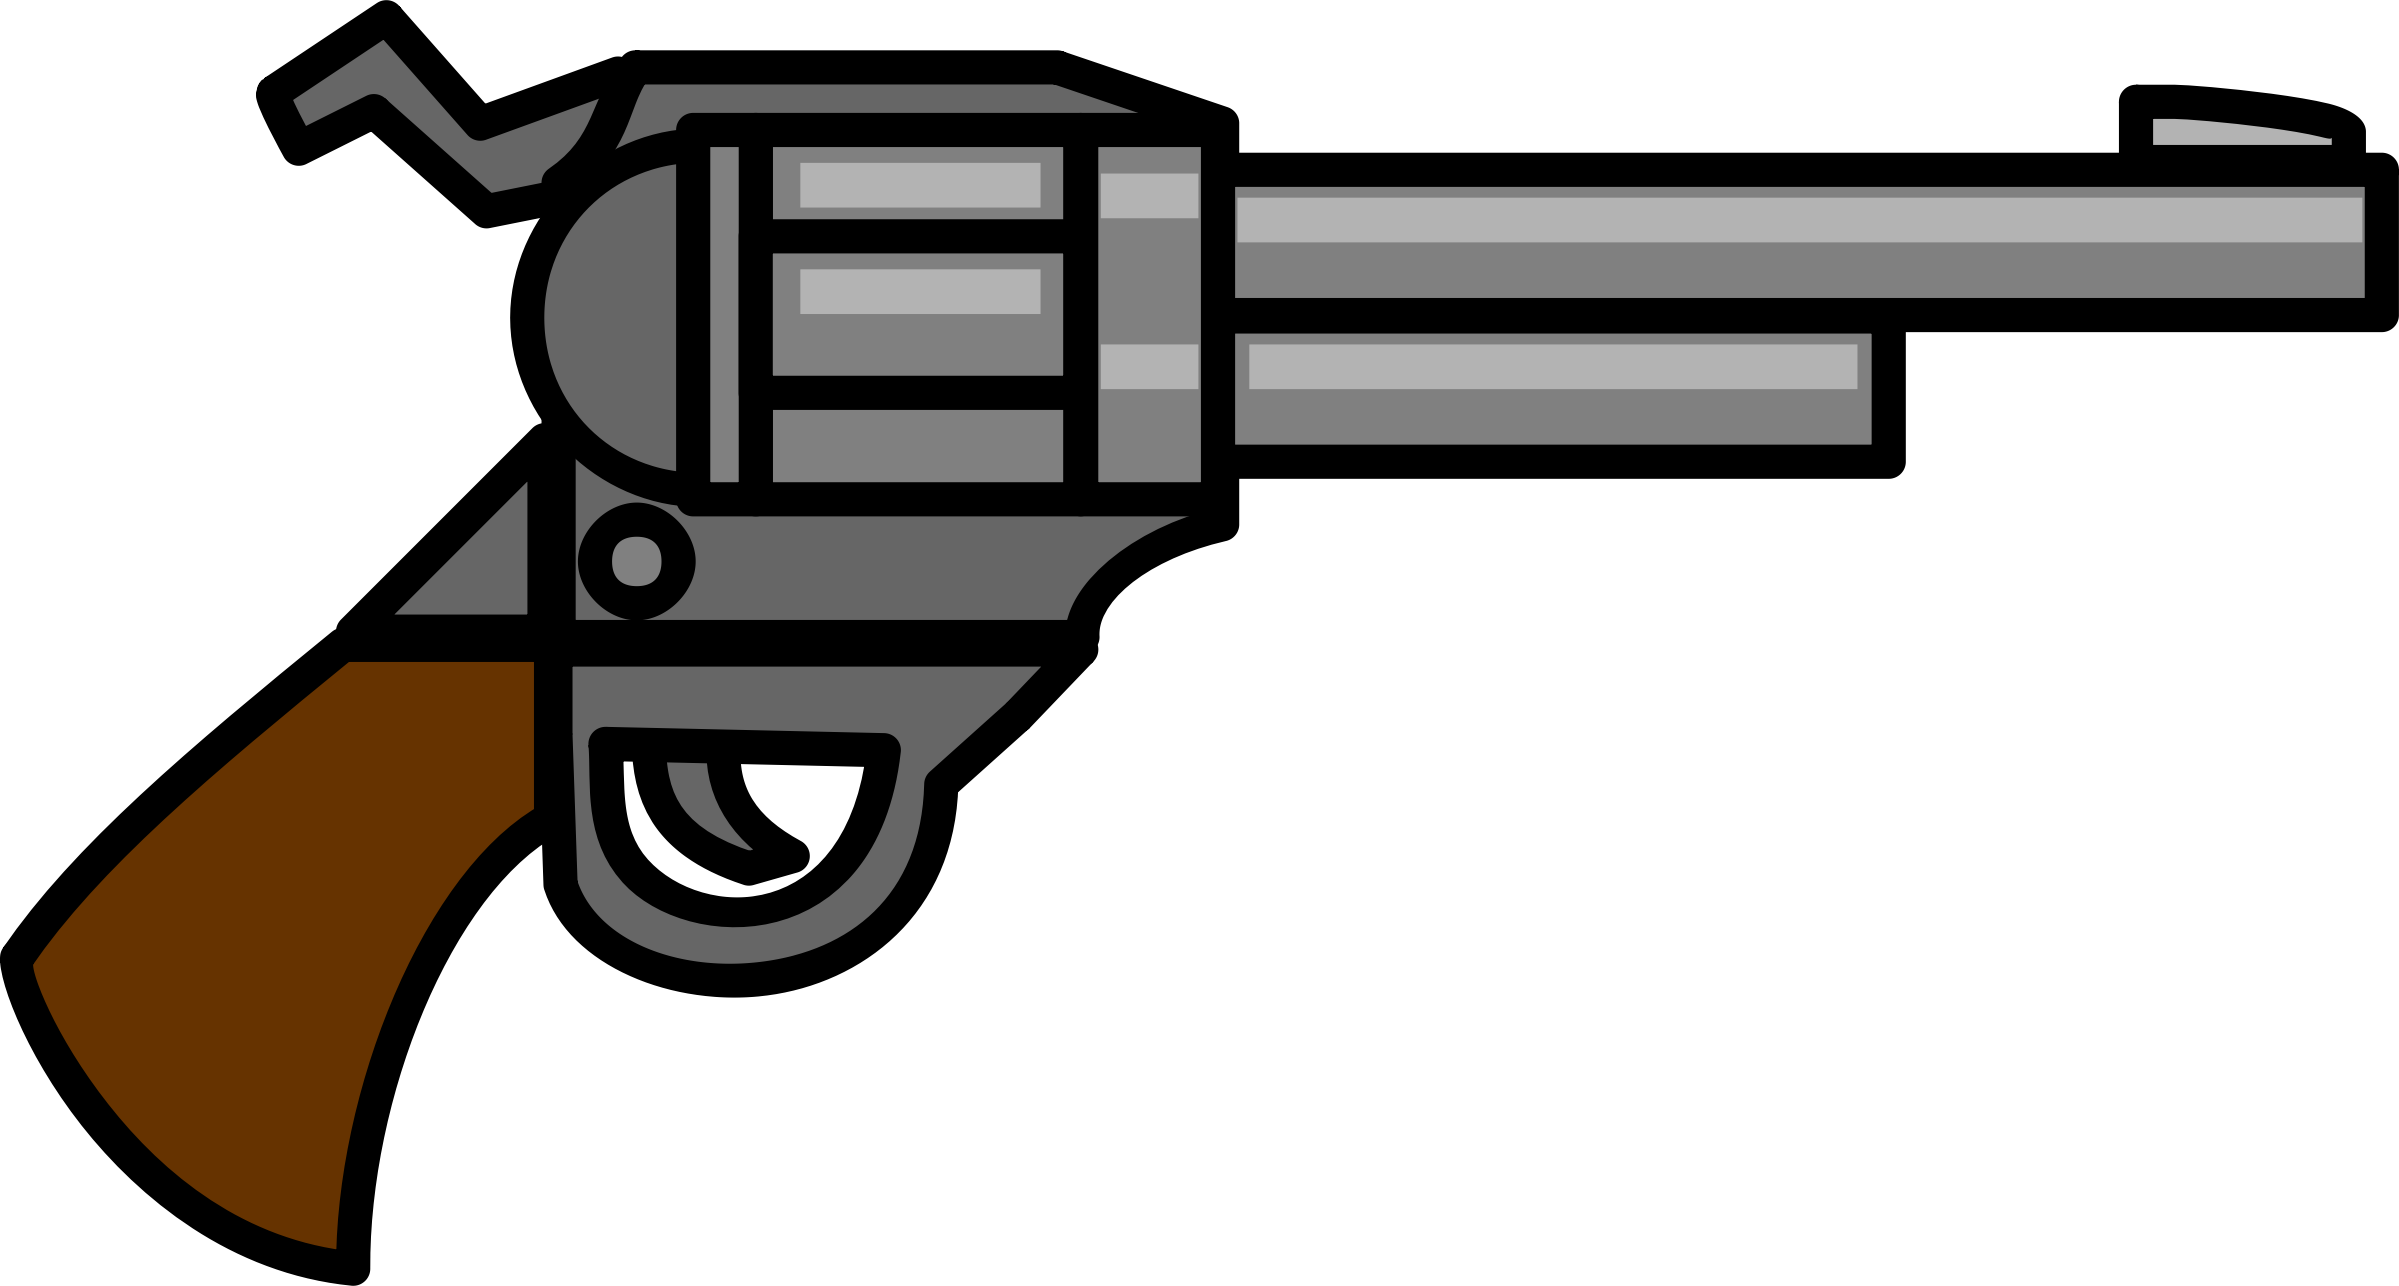 Pistol clipart rifle #8